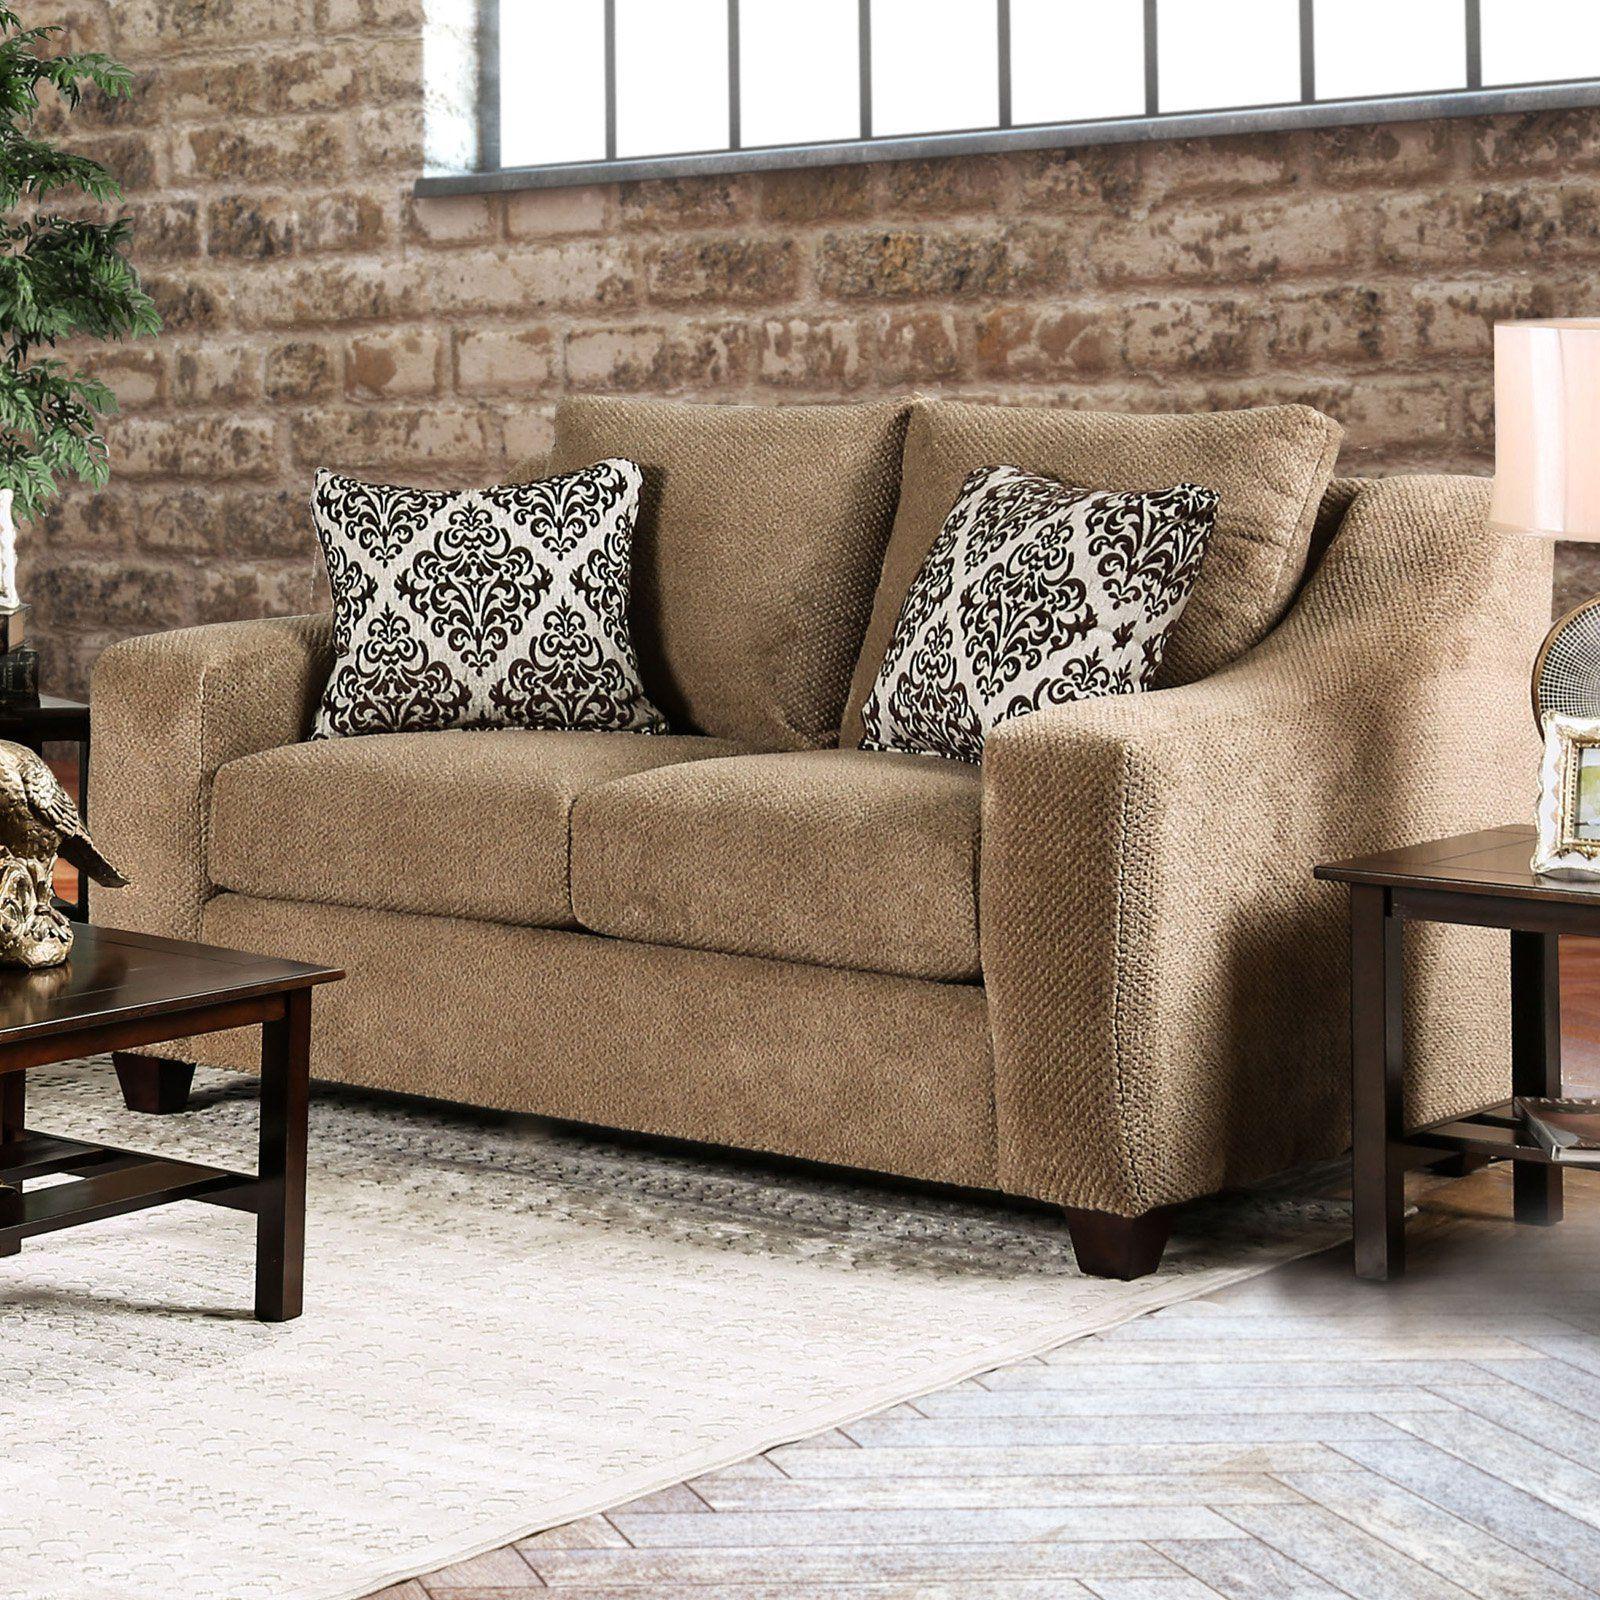 Super Furniture Of America Cowan Microfiber Loveseat In 2019 Ncnpc Chair Design For Home Ncnpcorg